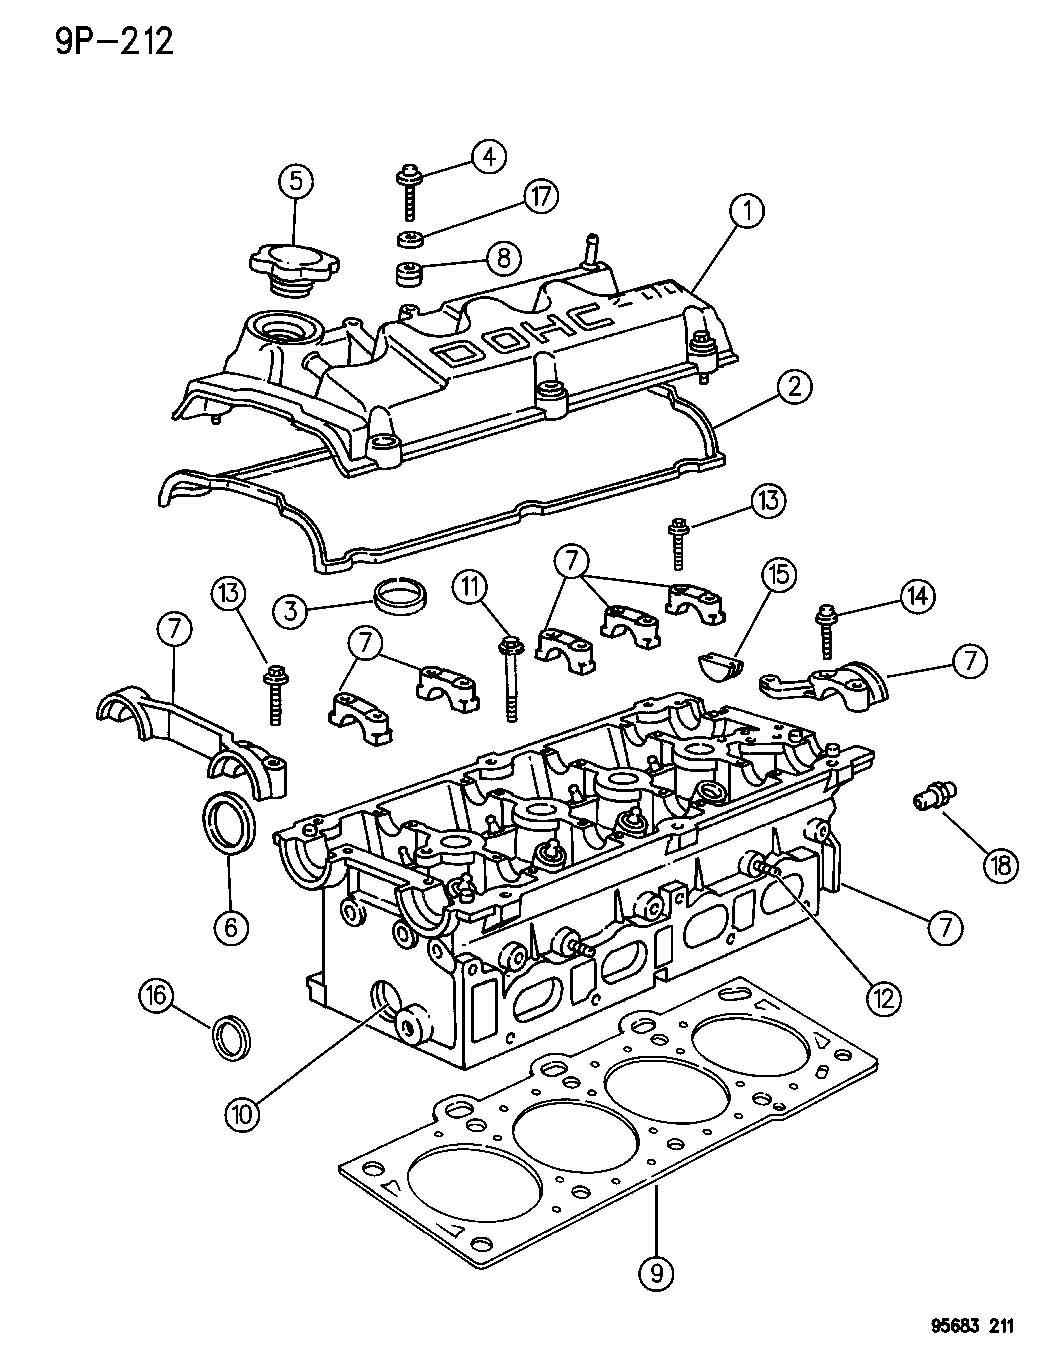 2001 daewoo nubira timing belt diagram likewise 2009 jeep liberty intake manifold gasket replacement furthermore 2001